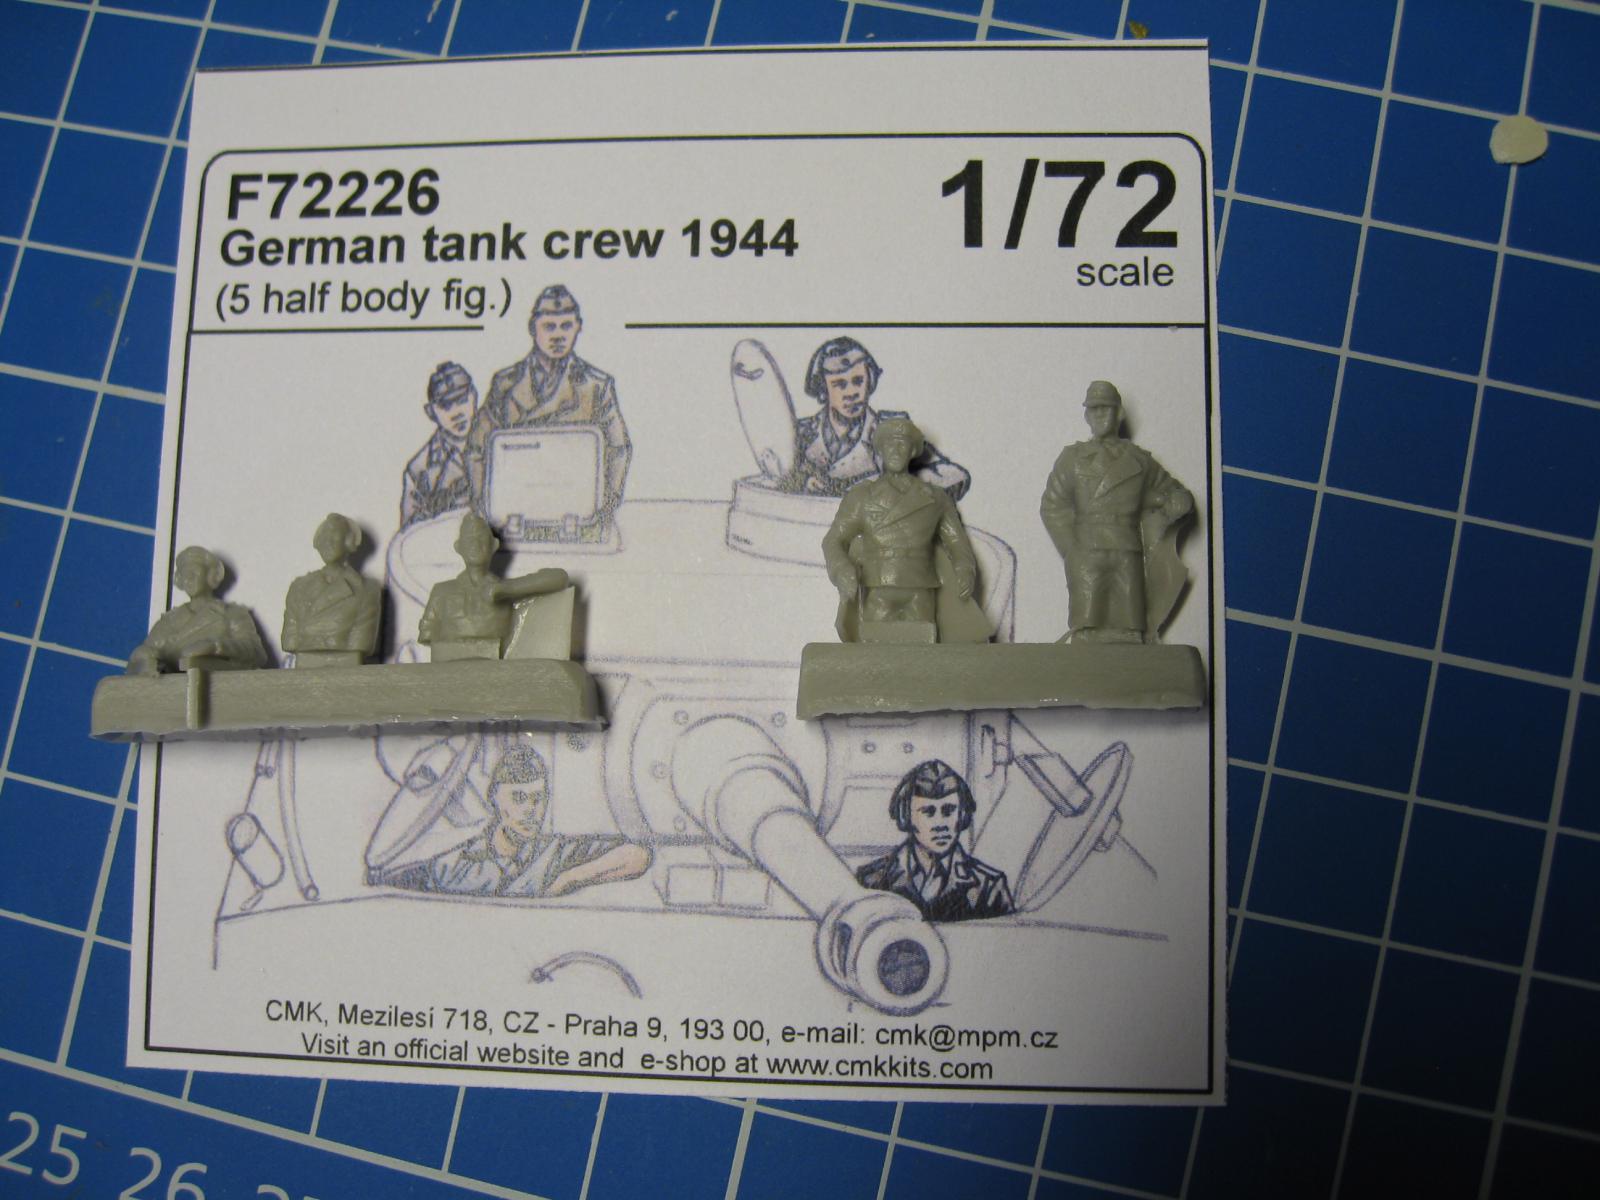 CMK - German Tank Crew 1944 + German Panzer Crew sitting  Kn1y-bn-0d0f